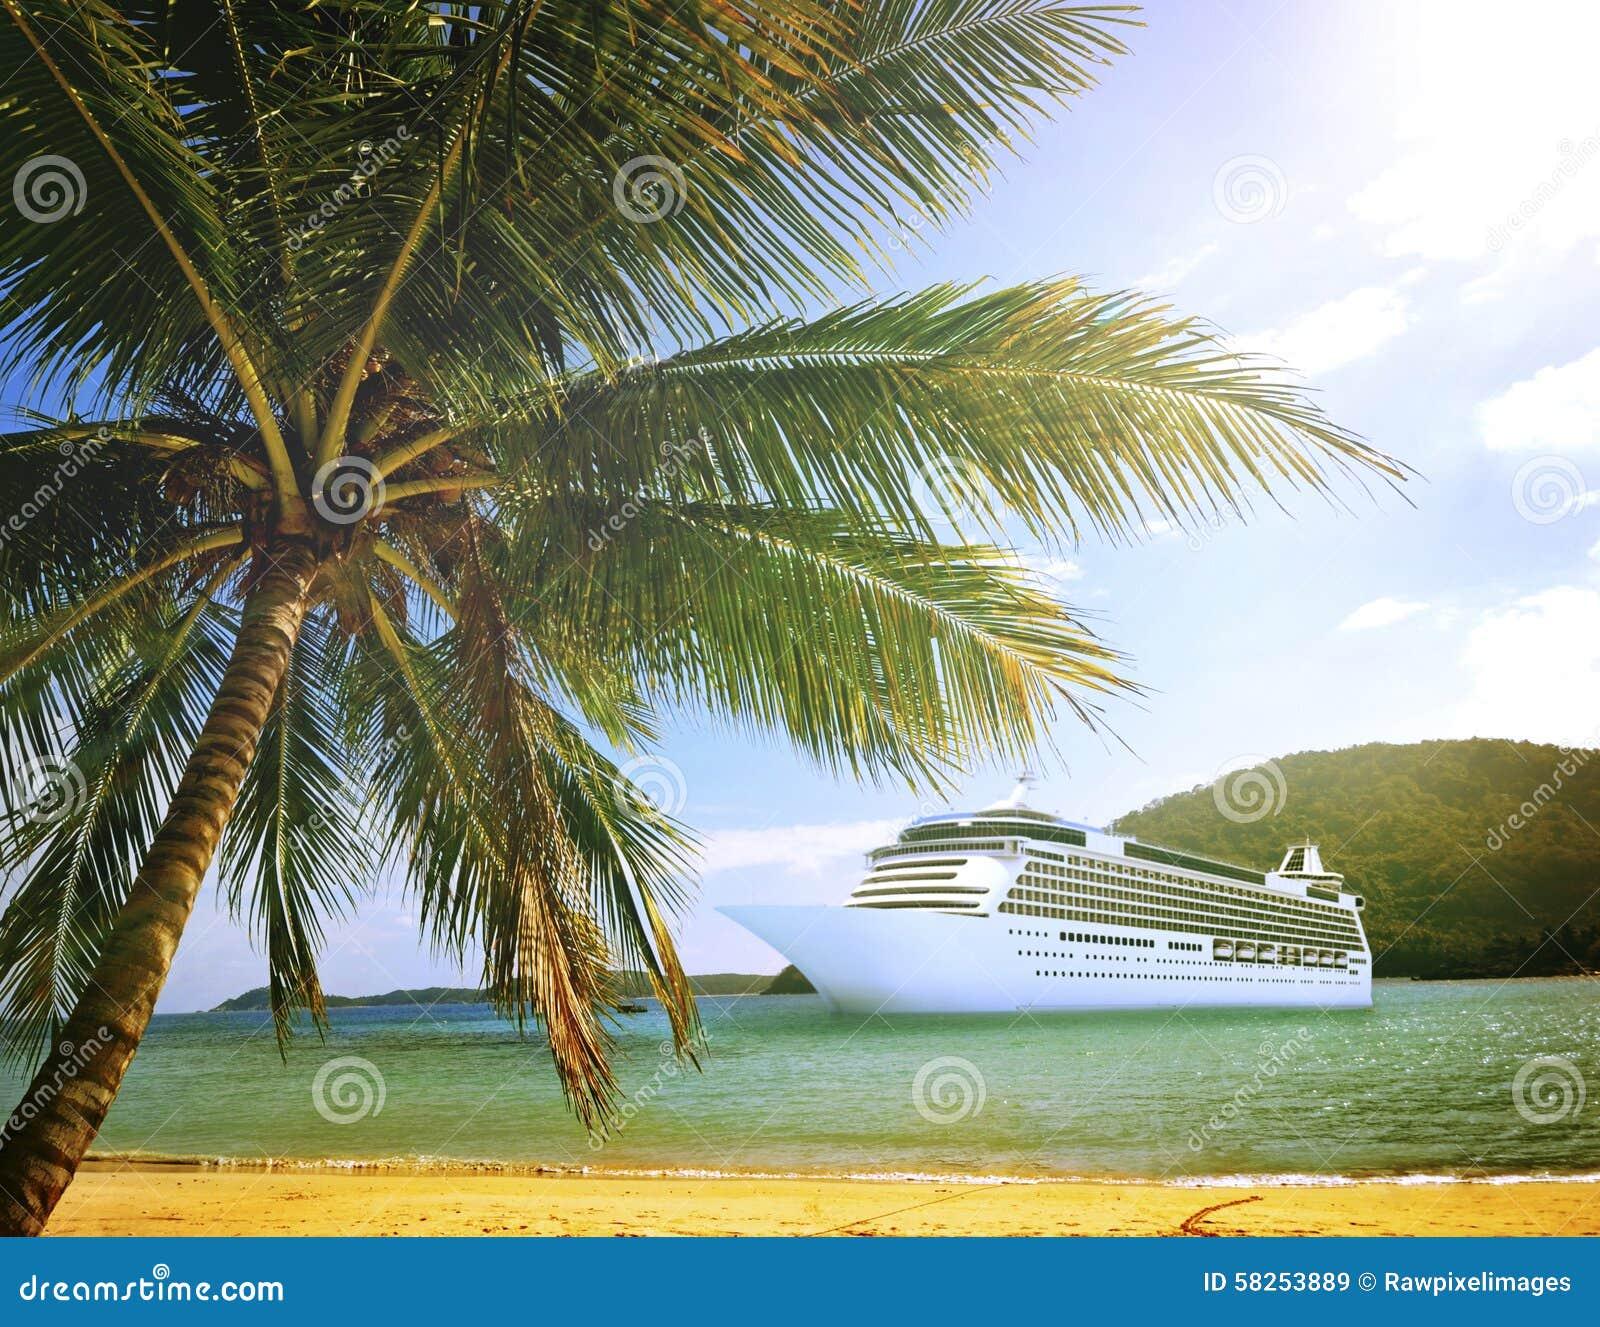 Tropical Island Beaches: Summer Tropical Island Beach Cruise Ship Concept Stock